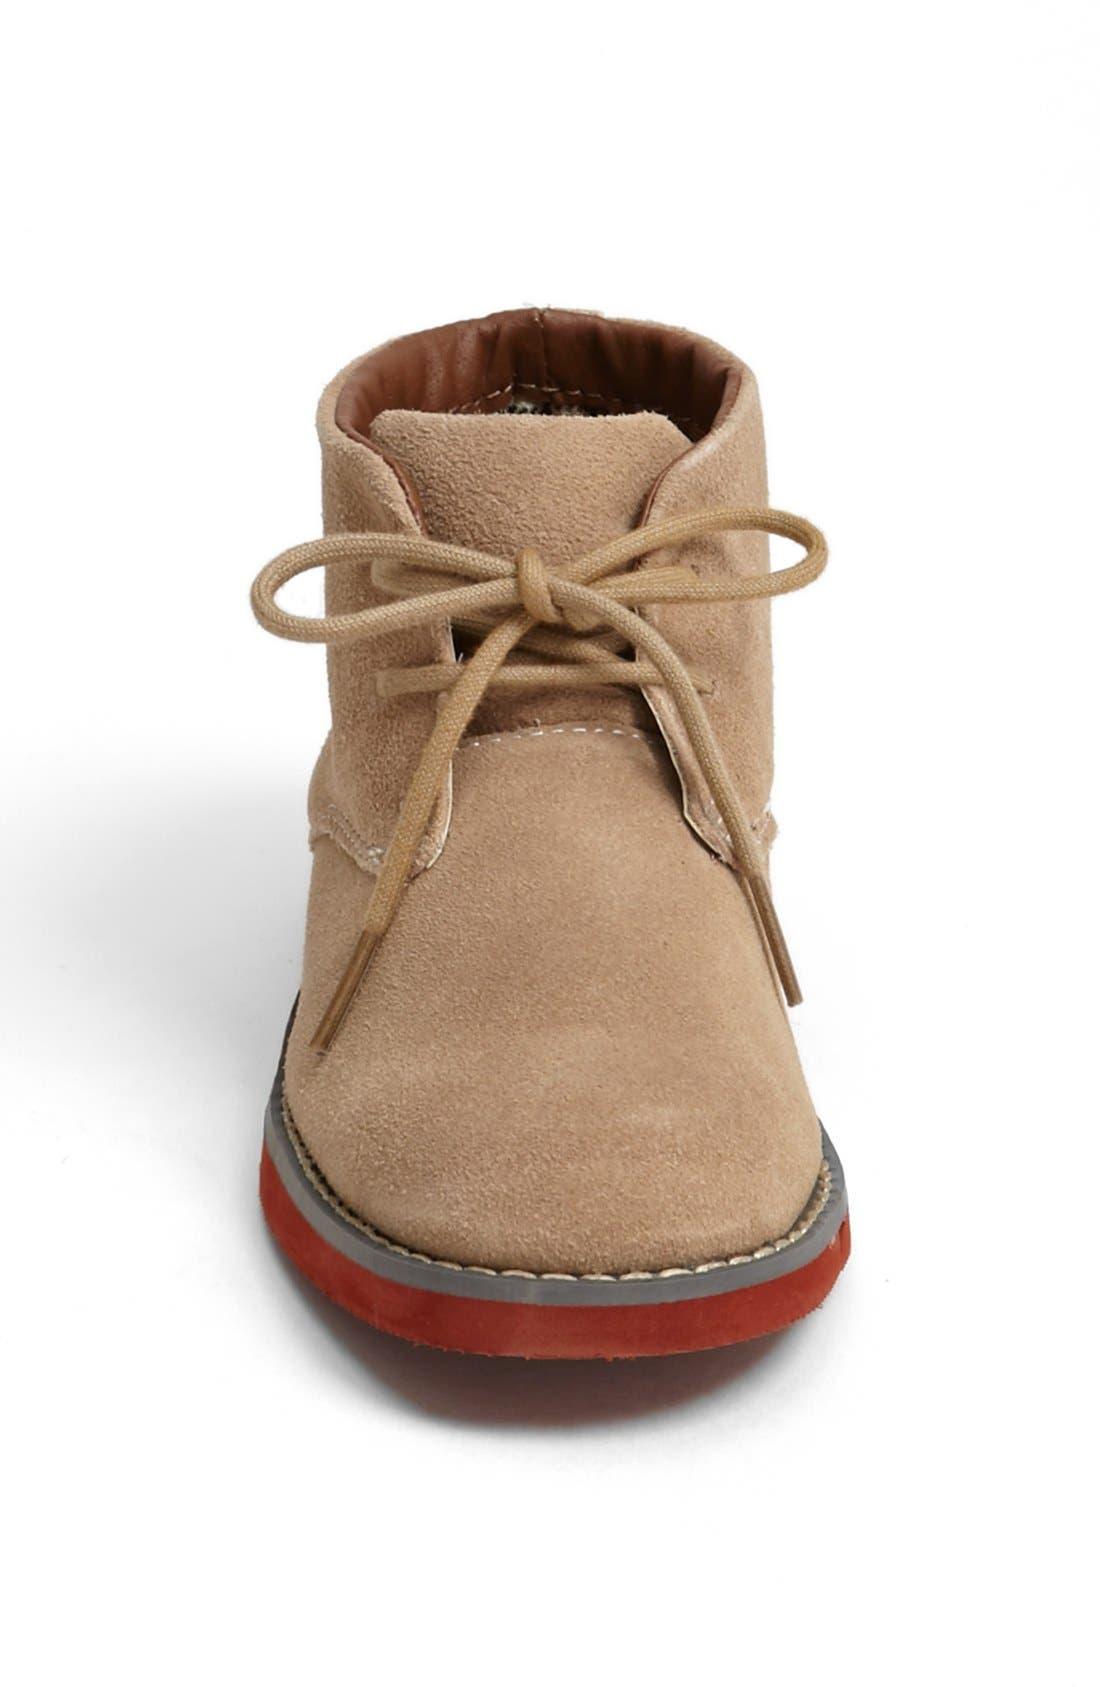 Alternate Image 3  - Florsheim 'Doon' Chukka Boot (Toddler, Little Kid & Big Kid)